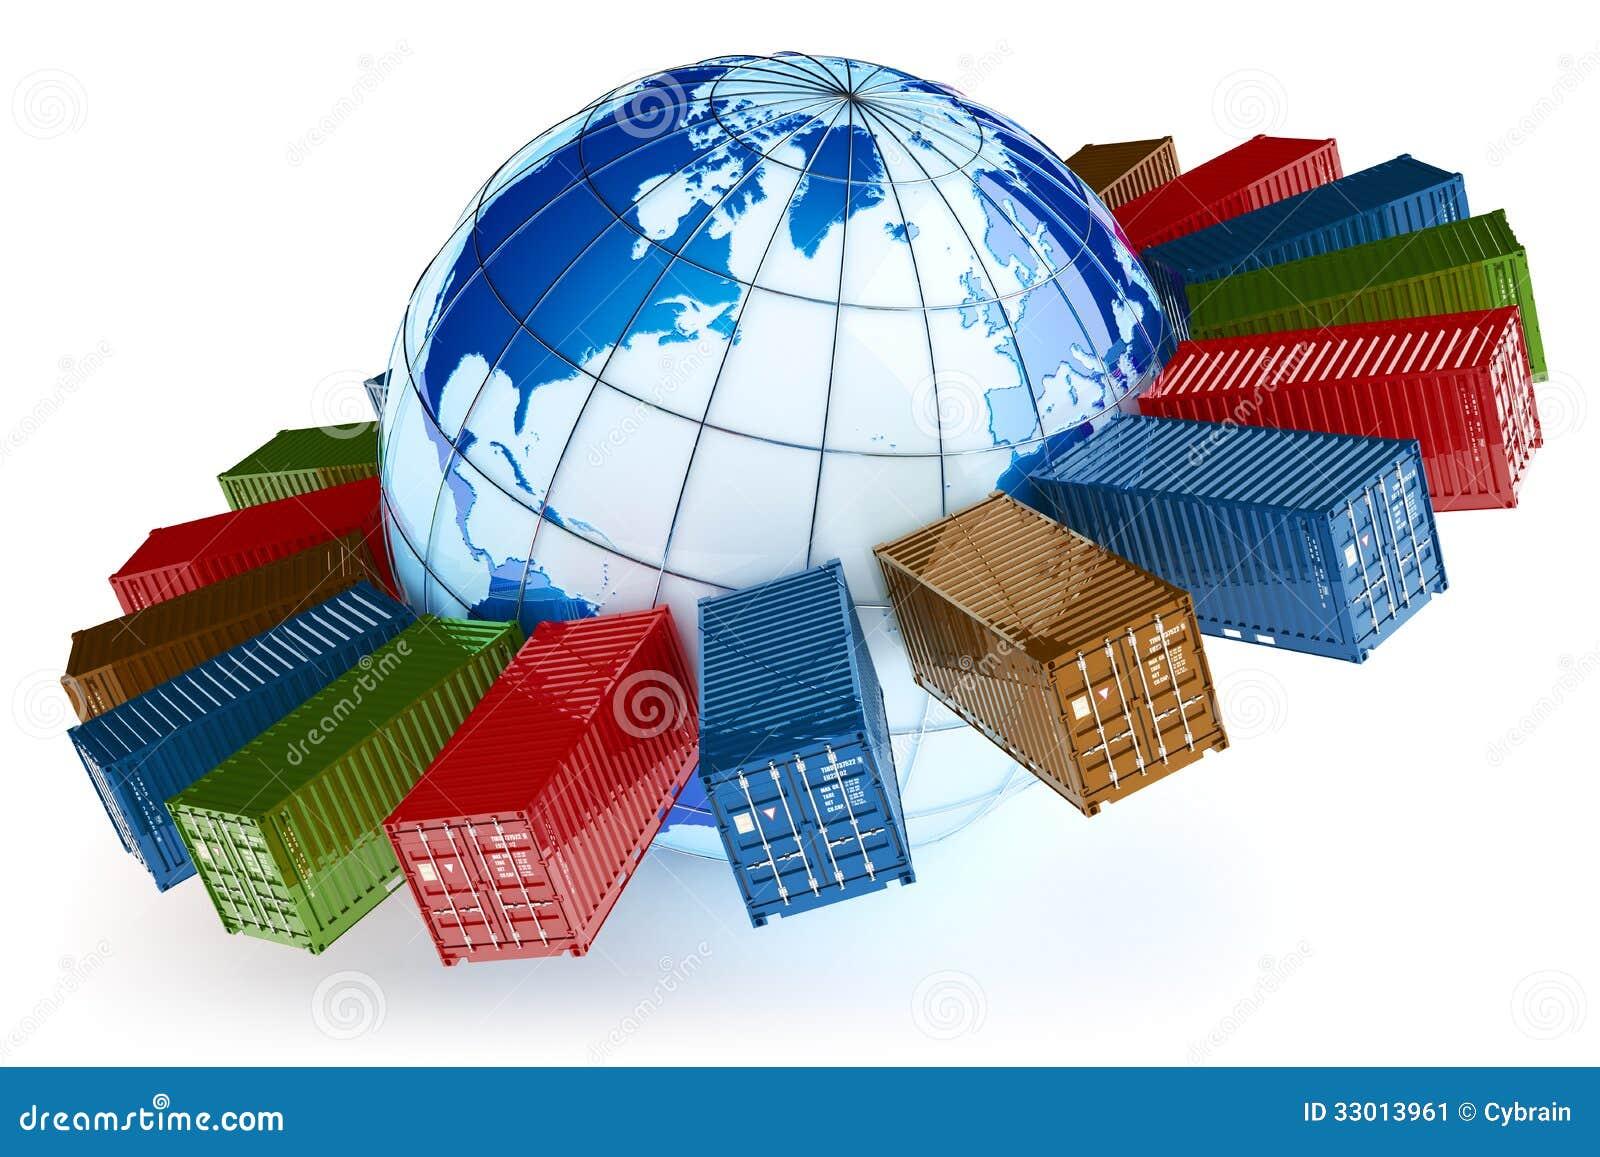 Steps to Start an International Trading Business